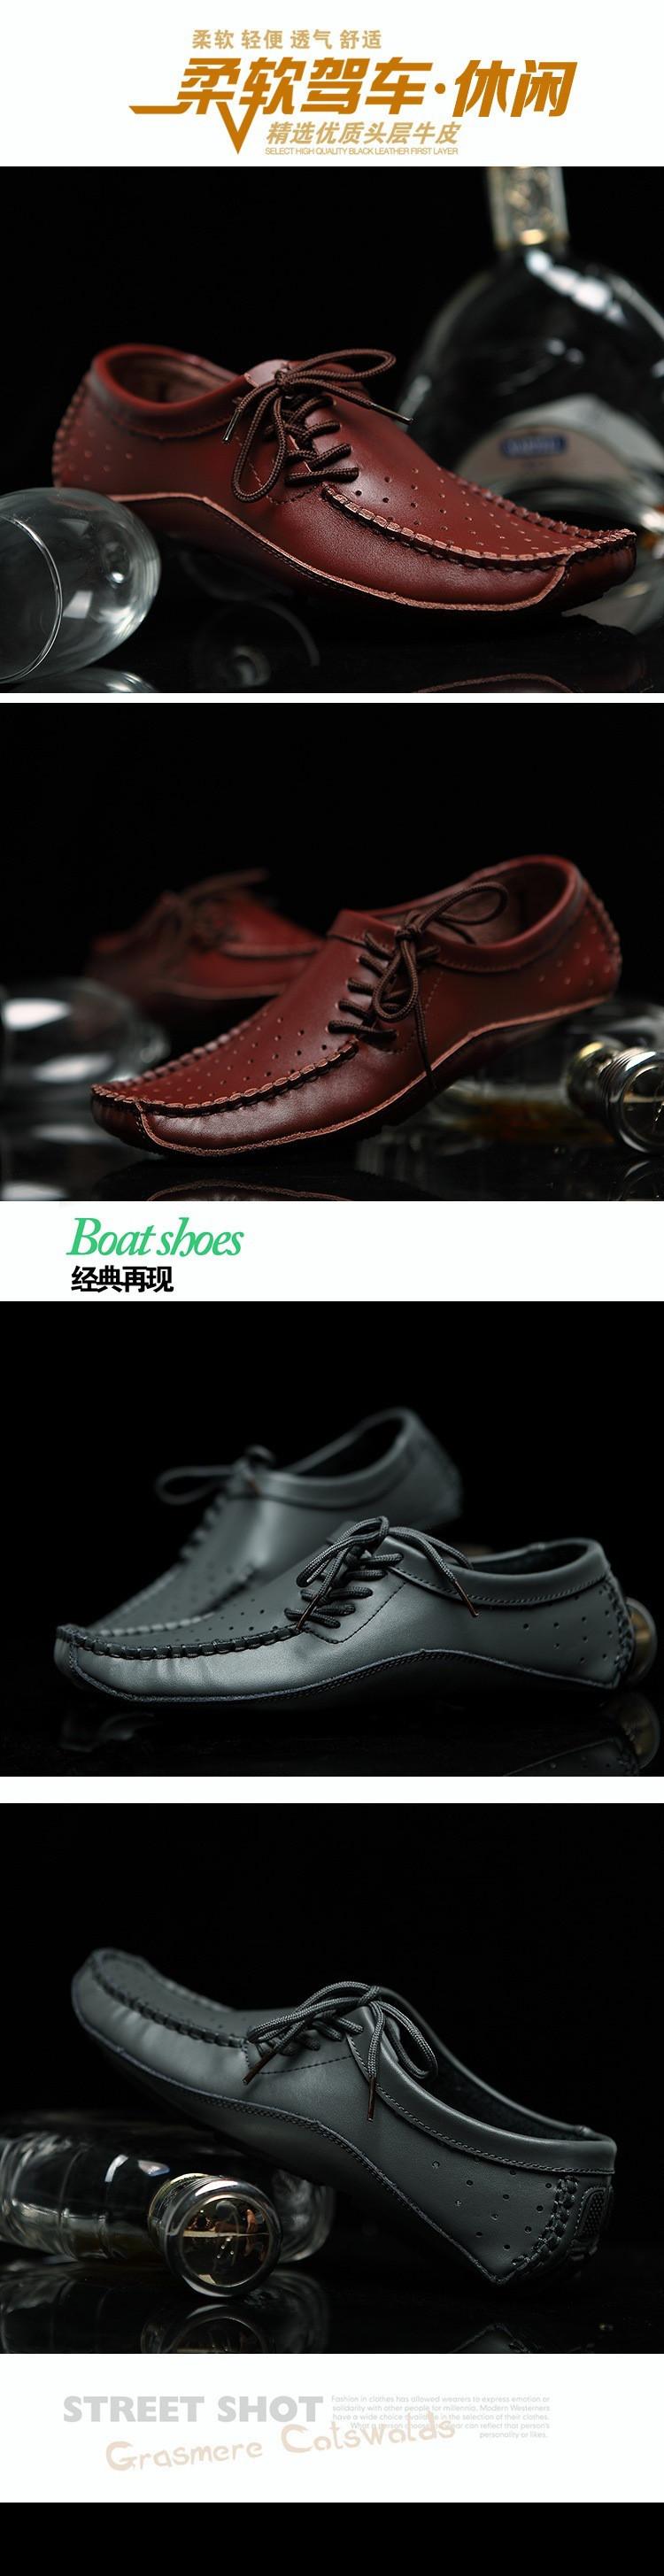 Мужские кроссовки sneaker s126